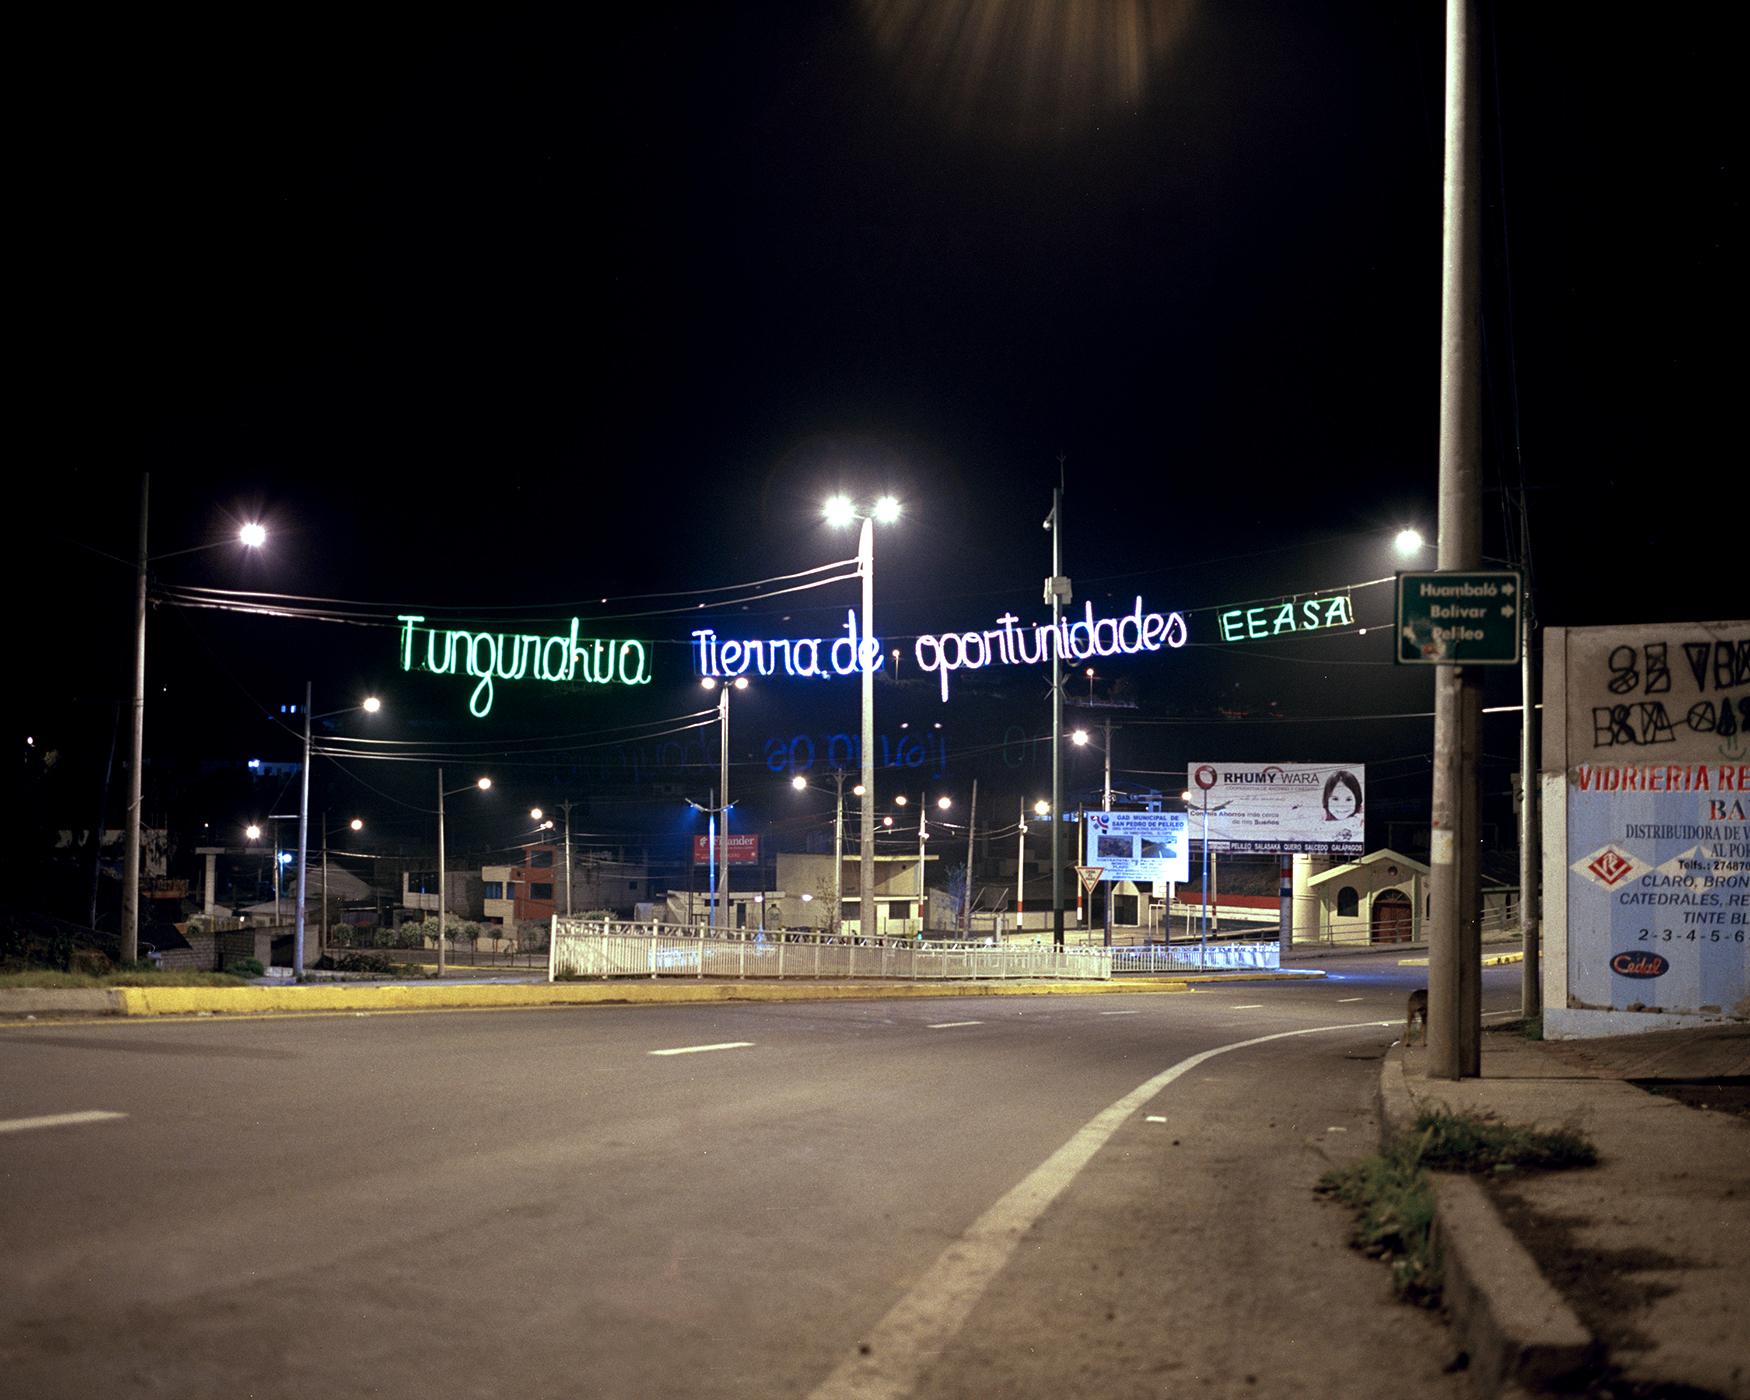 Tungurahua_001.jpg